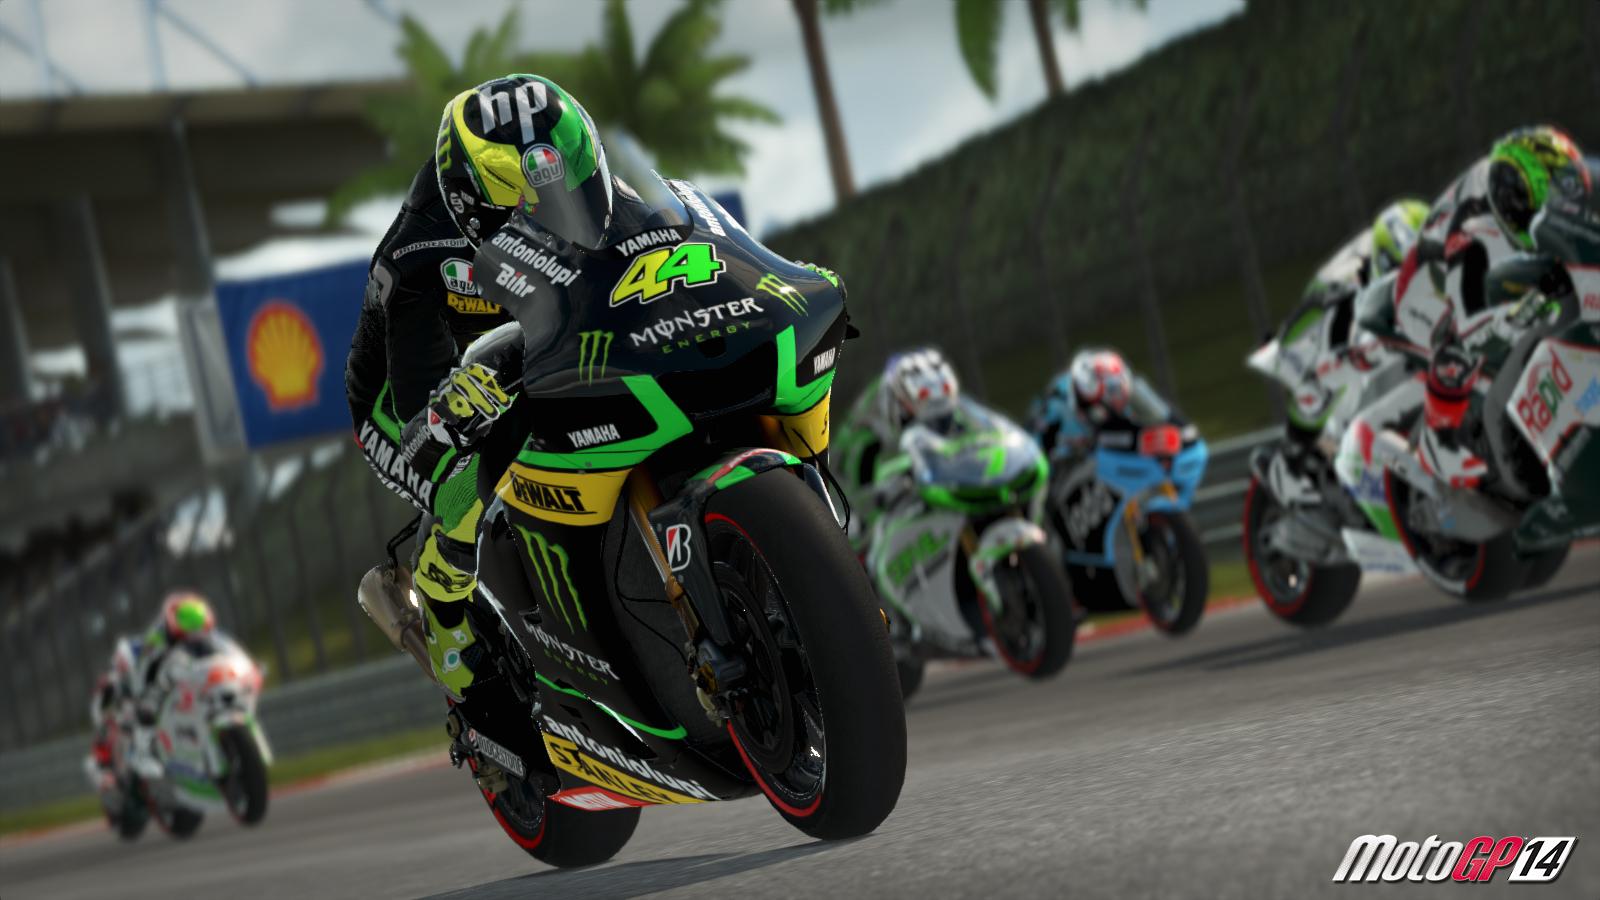 MotoGP 14 Multilenguaje ESPAÑOL XBOX 360 (Región NTSC-U/PAL) 7